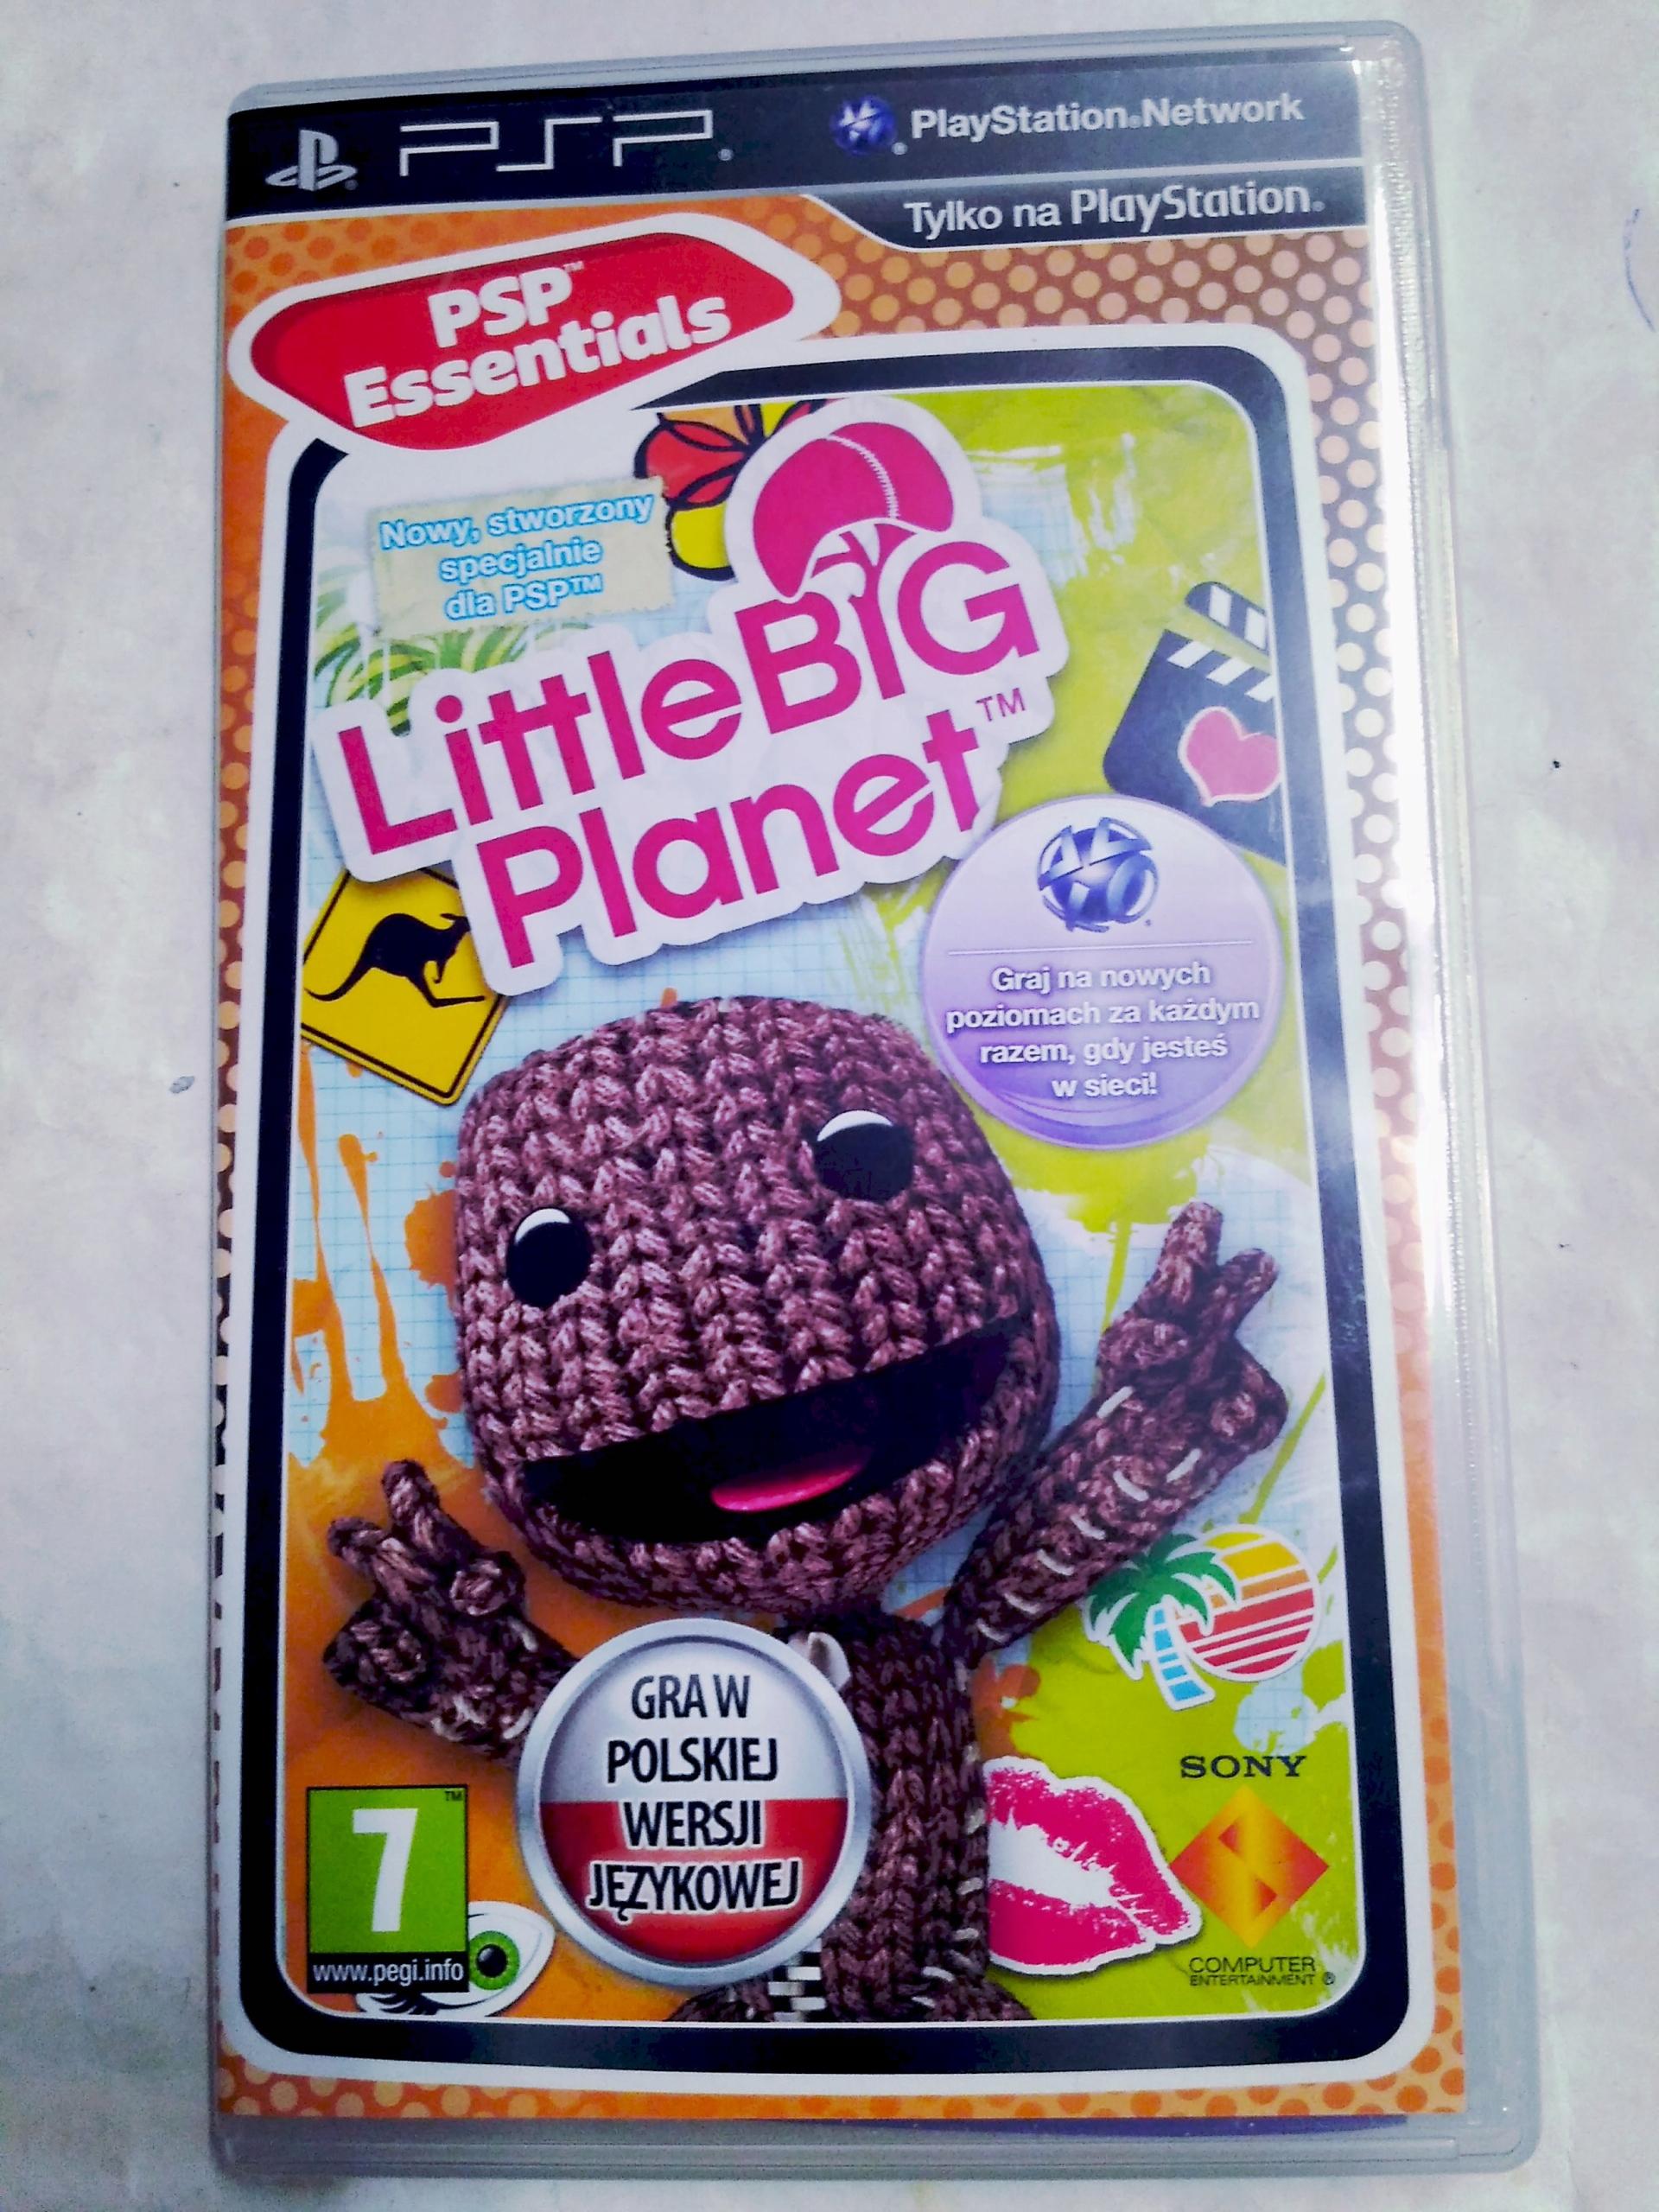 LittleBigPlanet PSP Polska Wersja